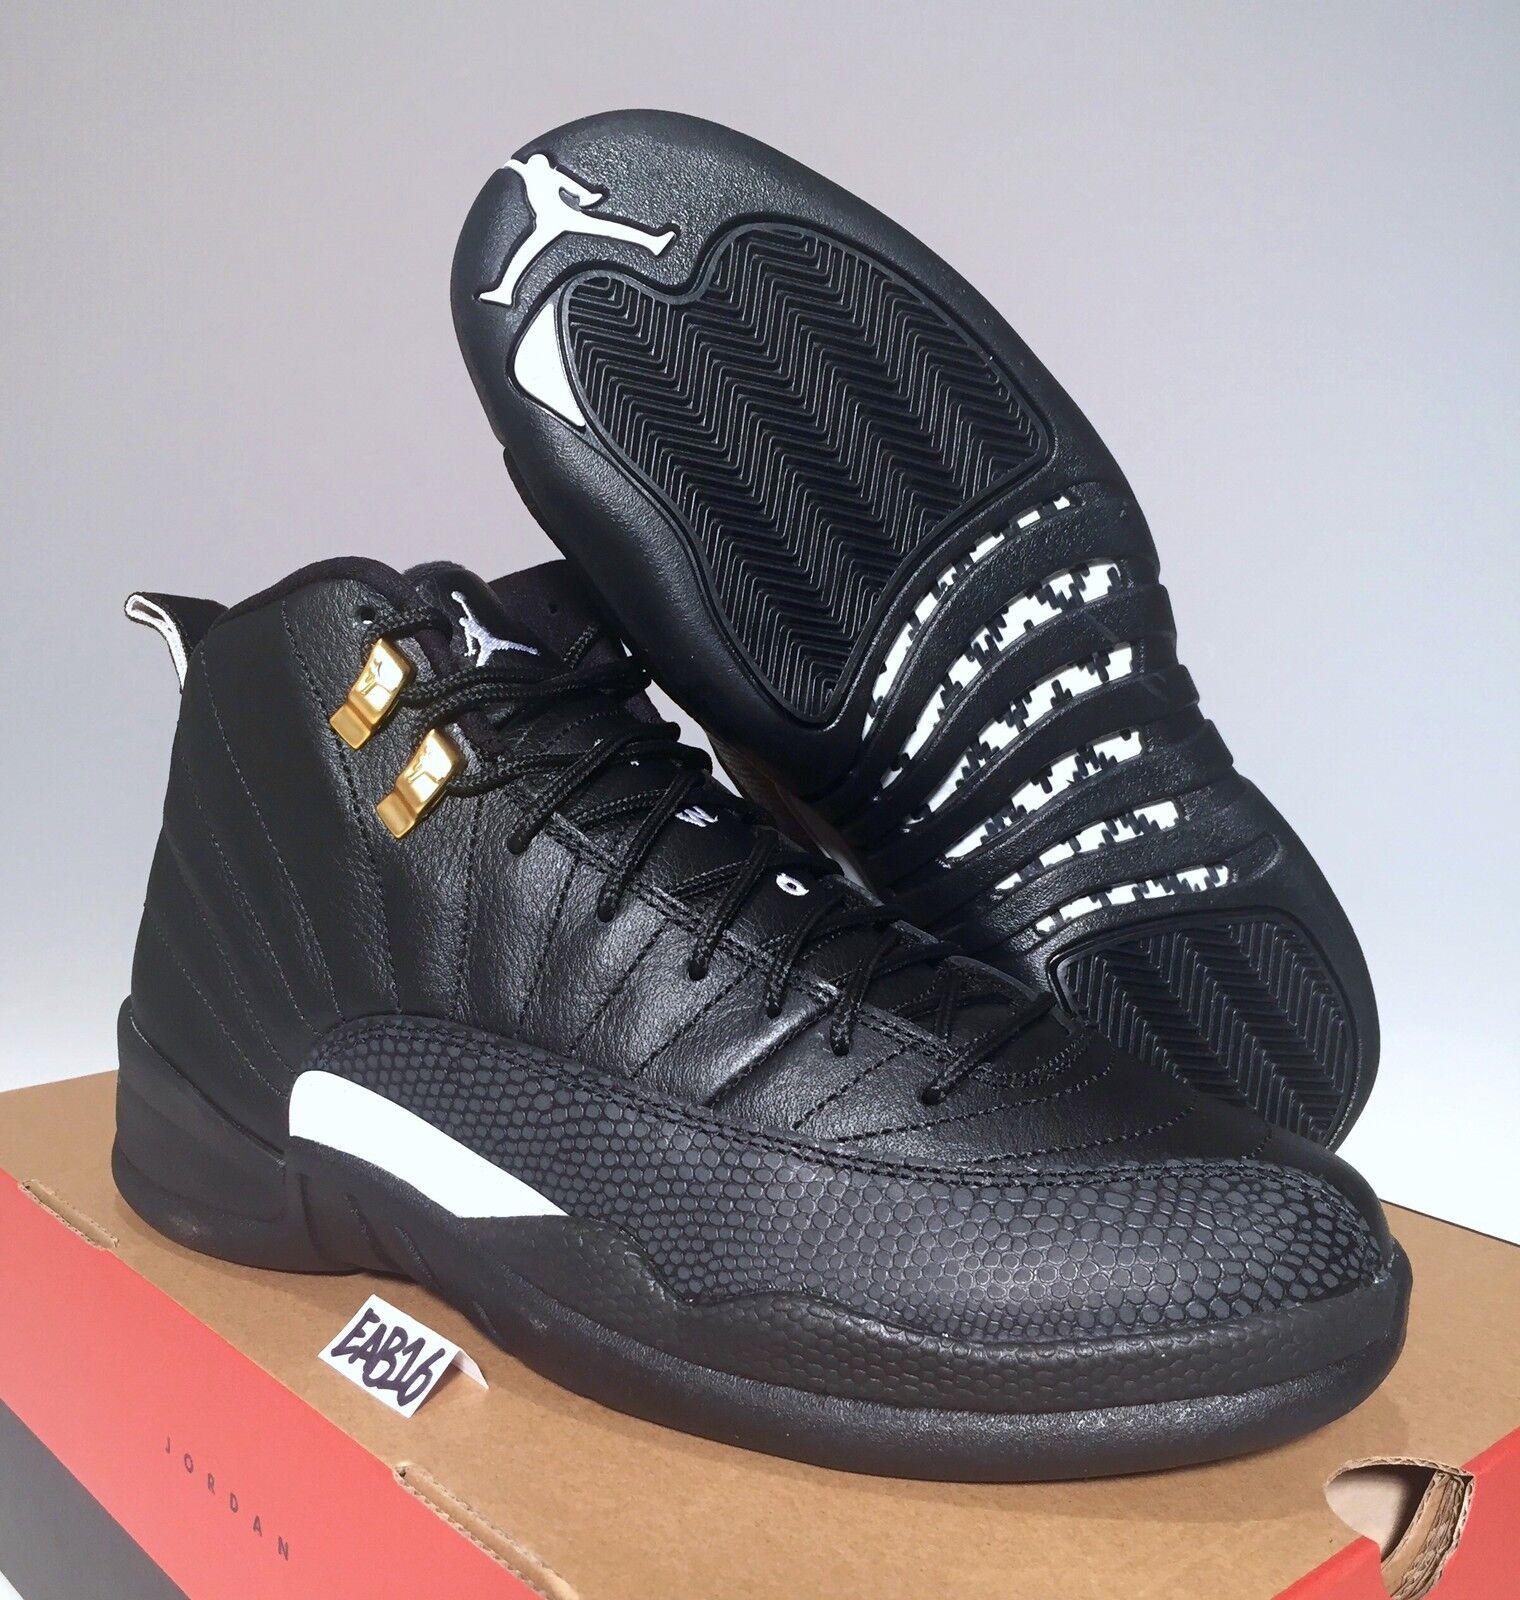 Nike Air Jordan Retro XII 12 The Master Black and White Masters Size 4-16